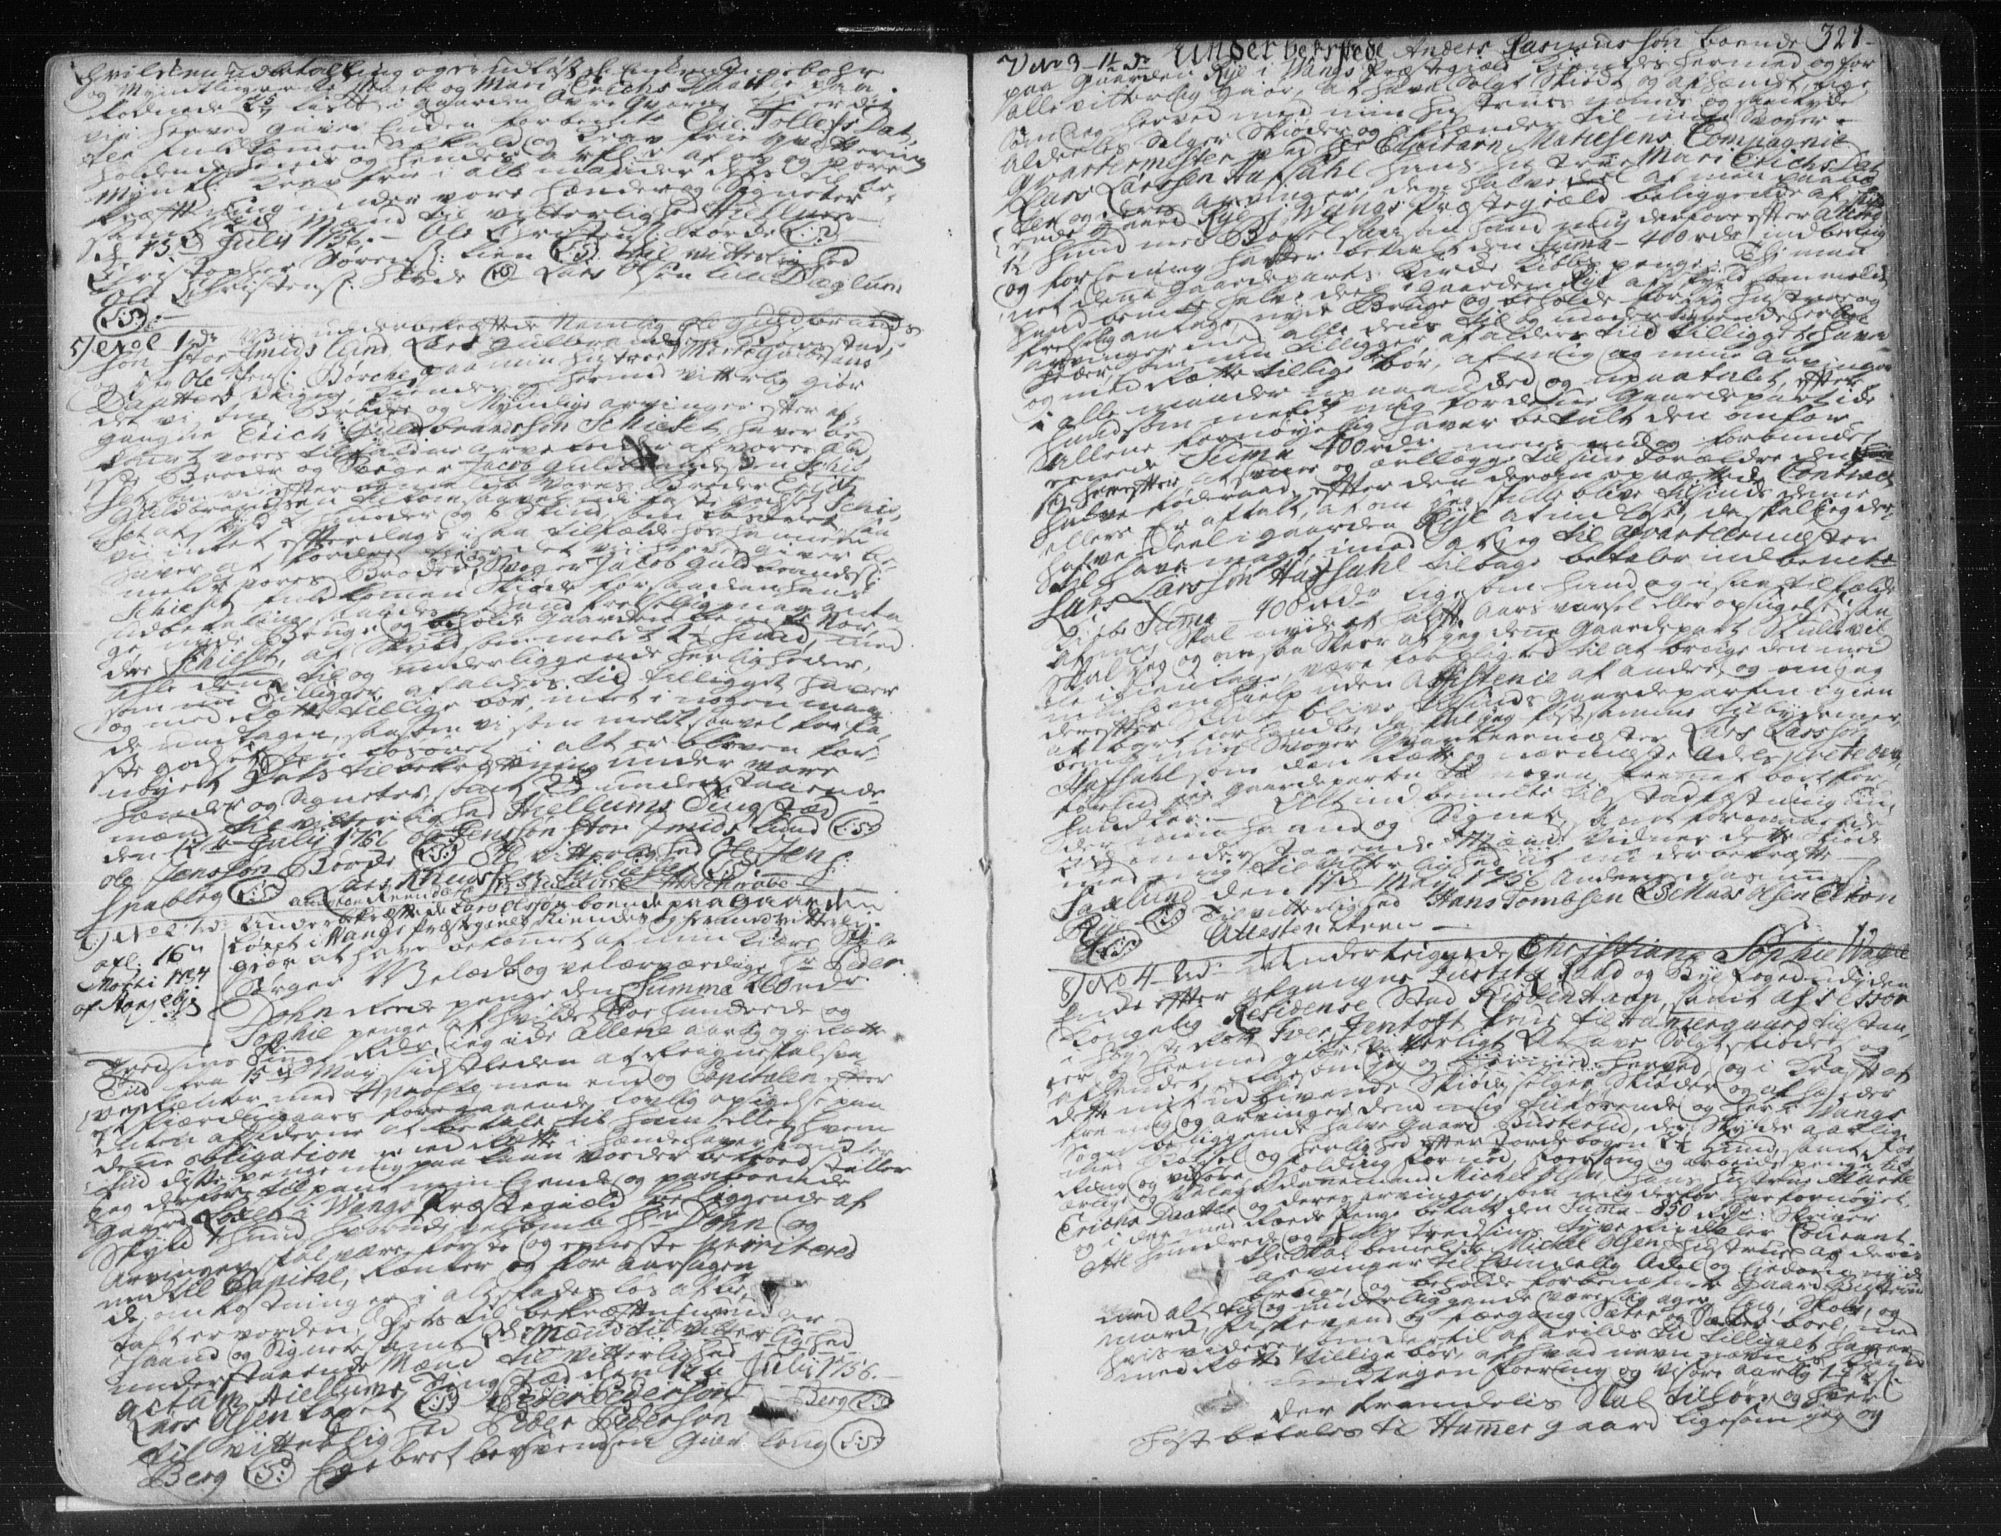 SAH, Hedemarken sorenskriveri, H/Hb/L0007B: Pantebok nr. 7b, 1756-1760, s. 321